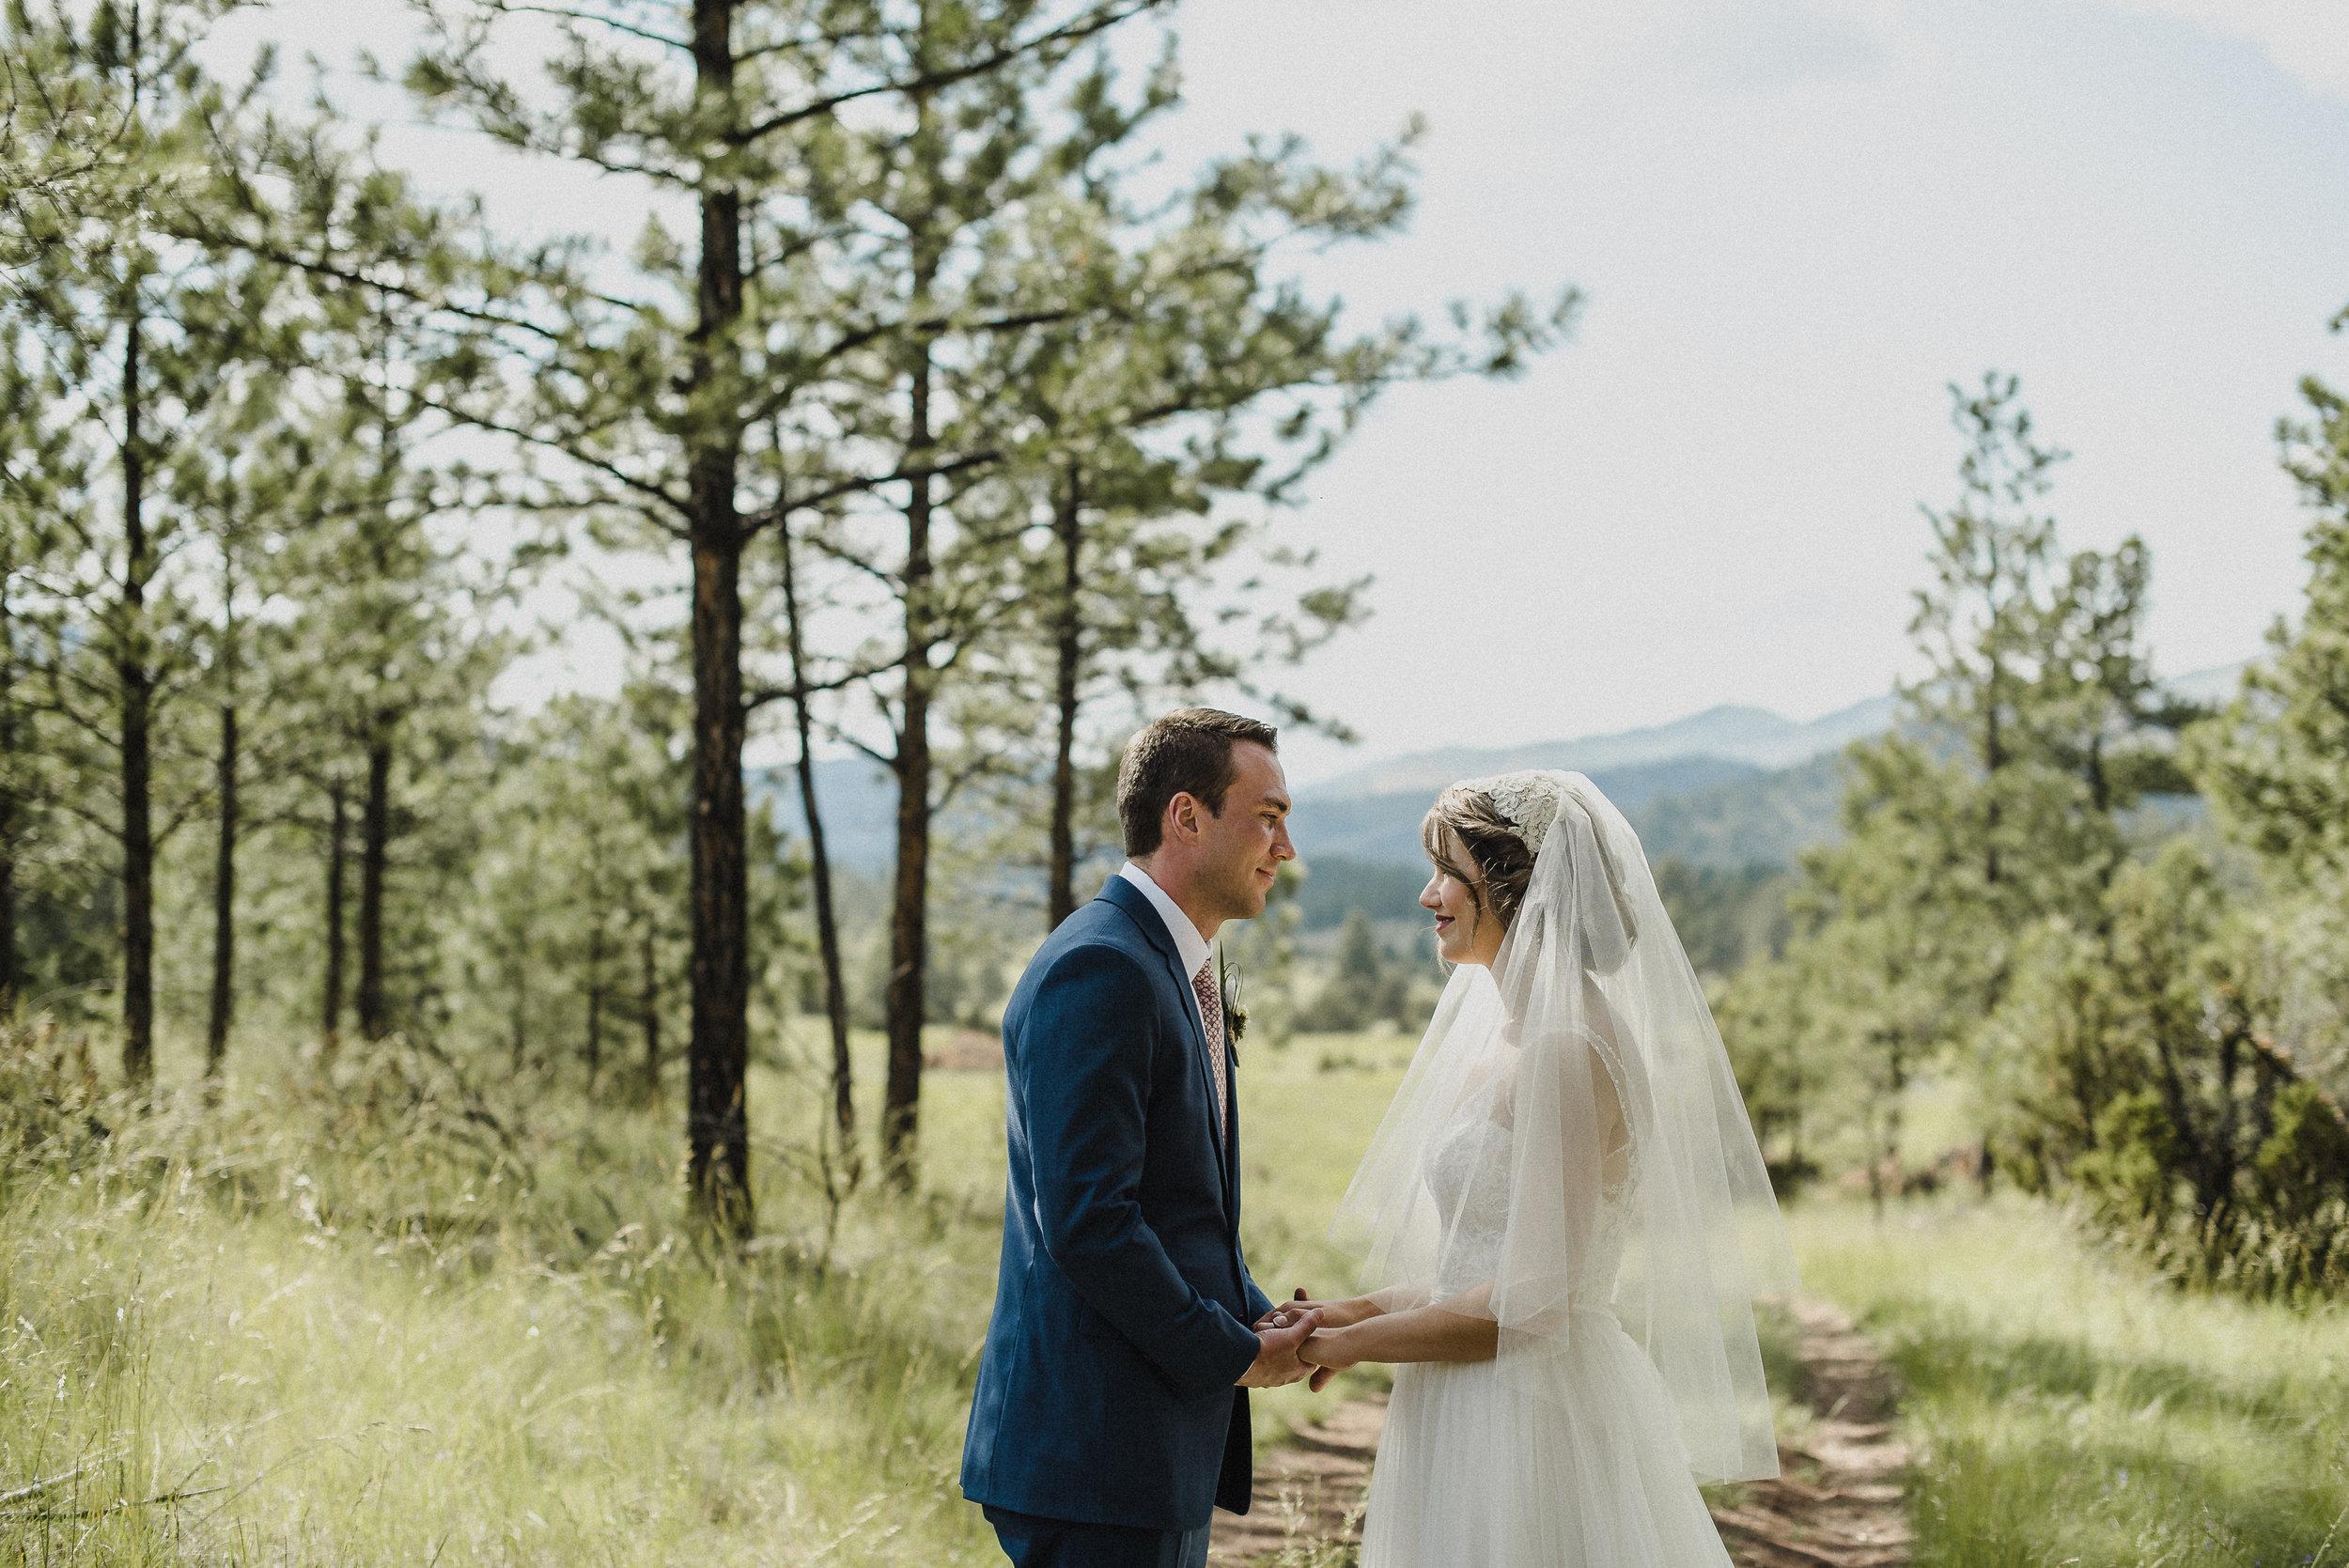 Beautiful wedding portraits at Summer Star Ranch